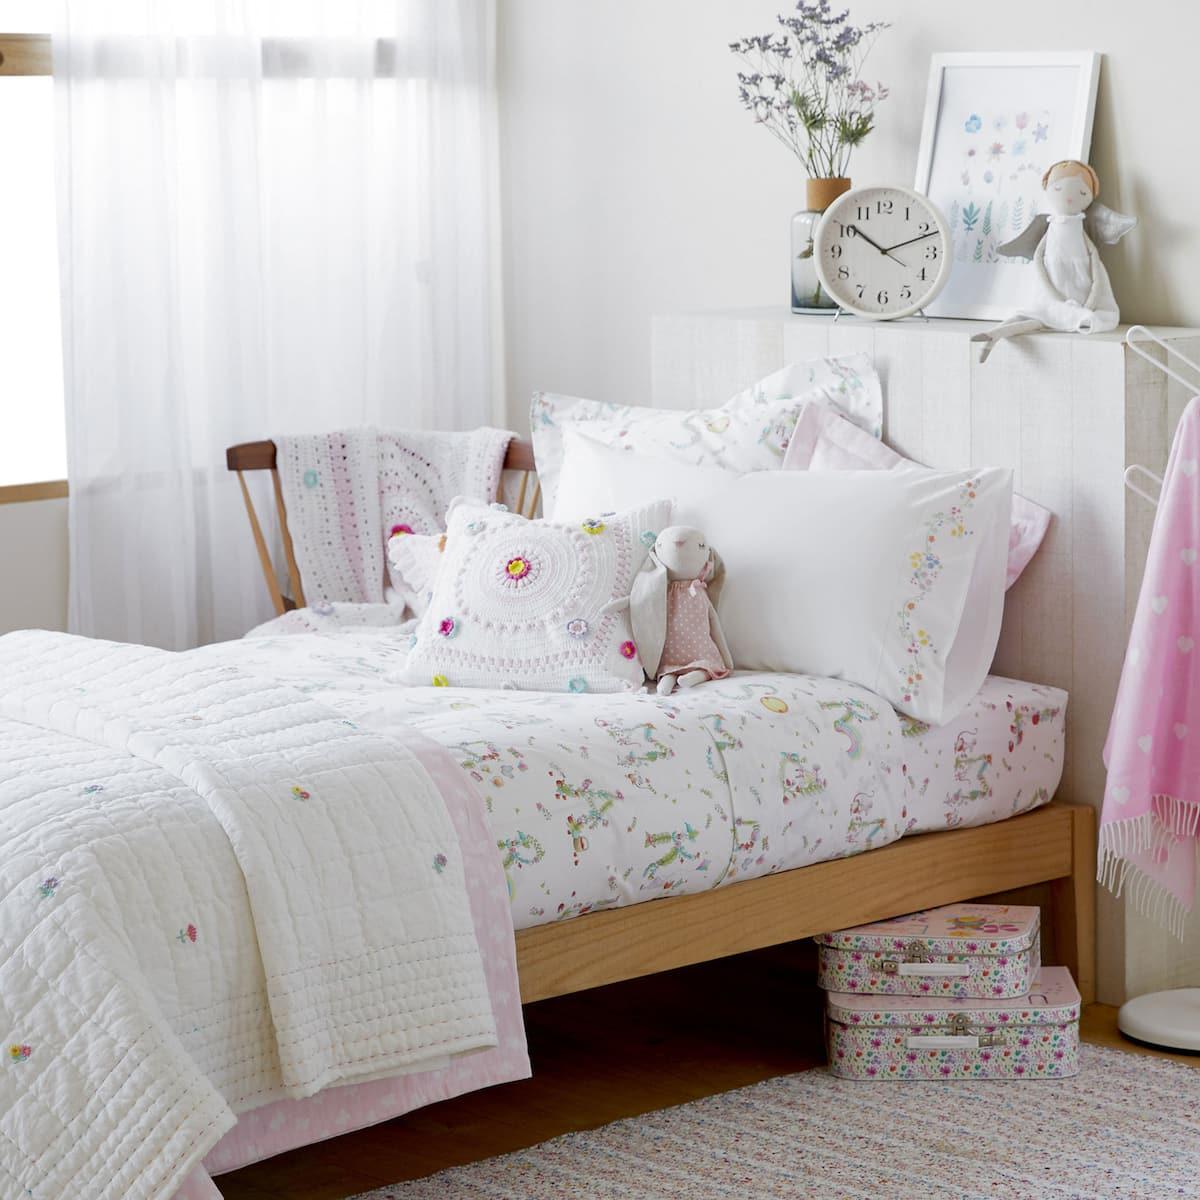 marie victoire mothes et vincent chabat ookoodoo. Black Bedroom Furniture Sets. Home Design Ideas